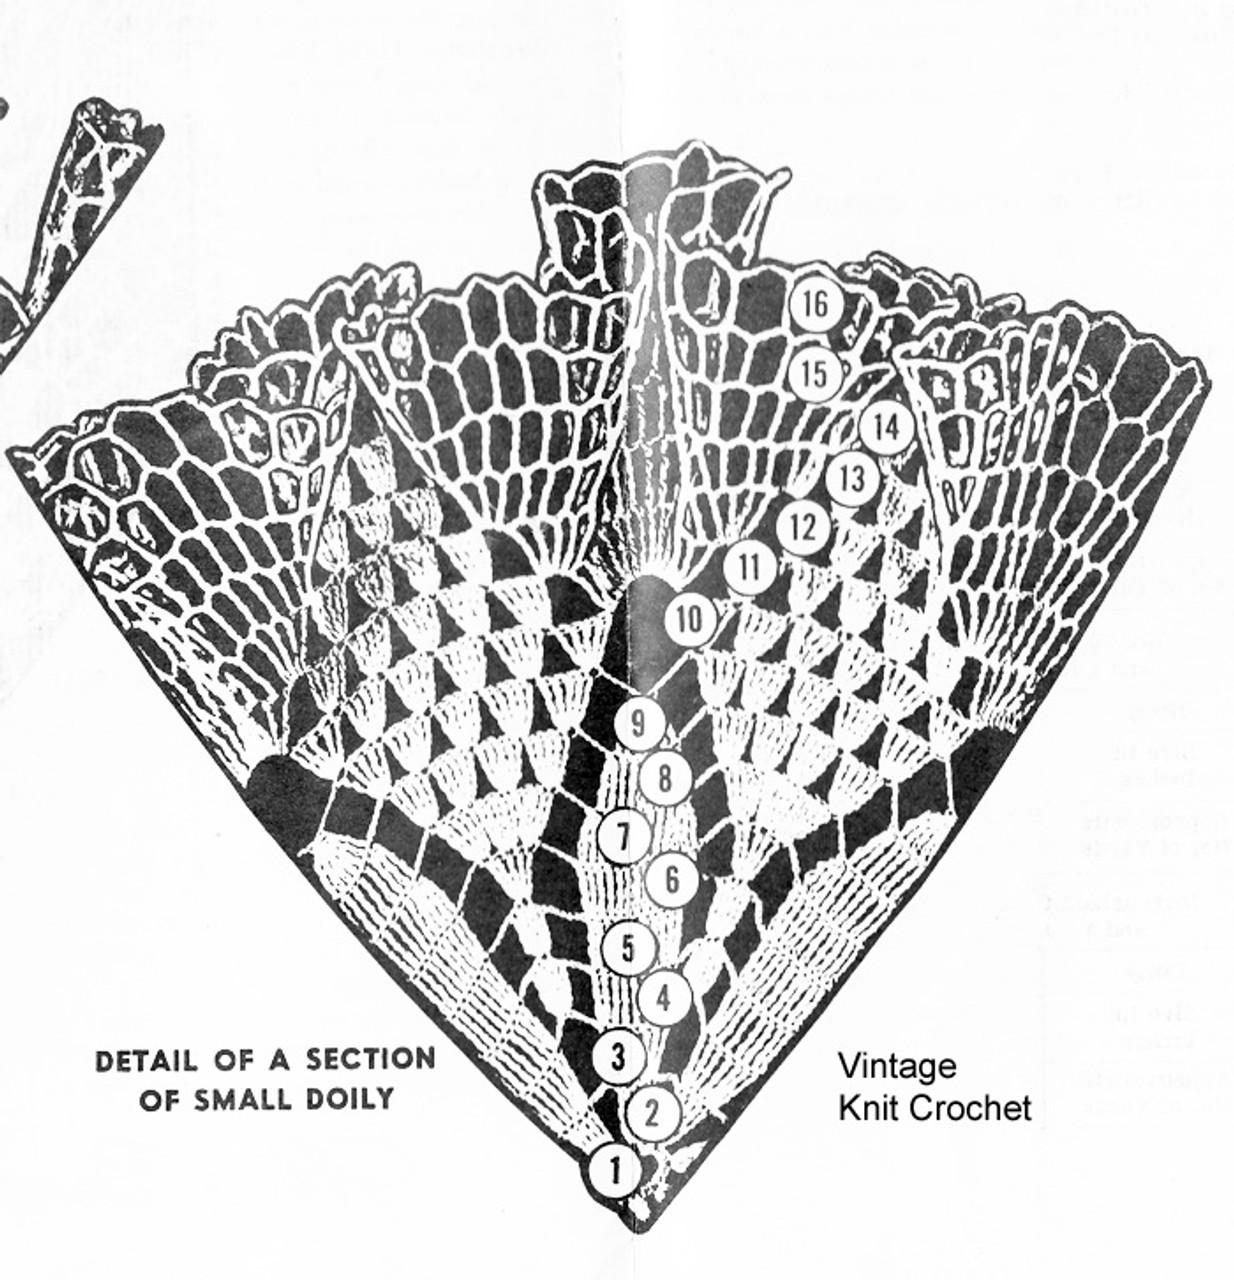 Small Ruffled Doily Pattern Illustration for Design 7049